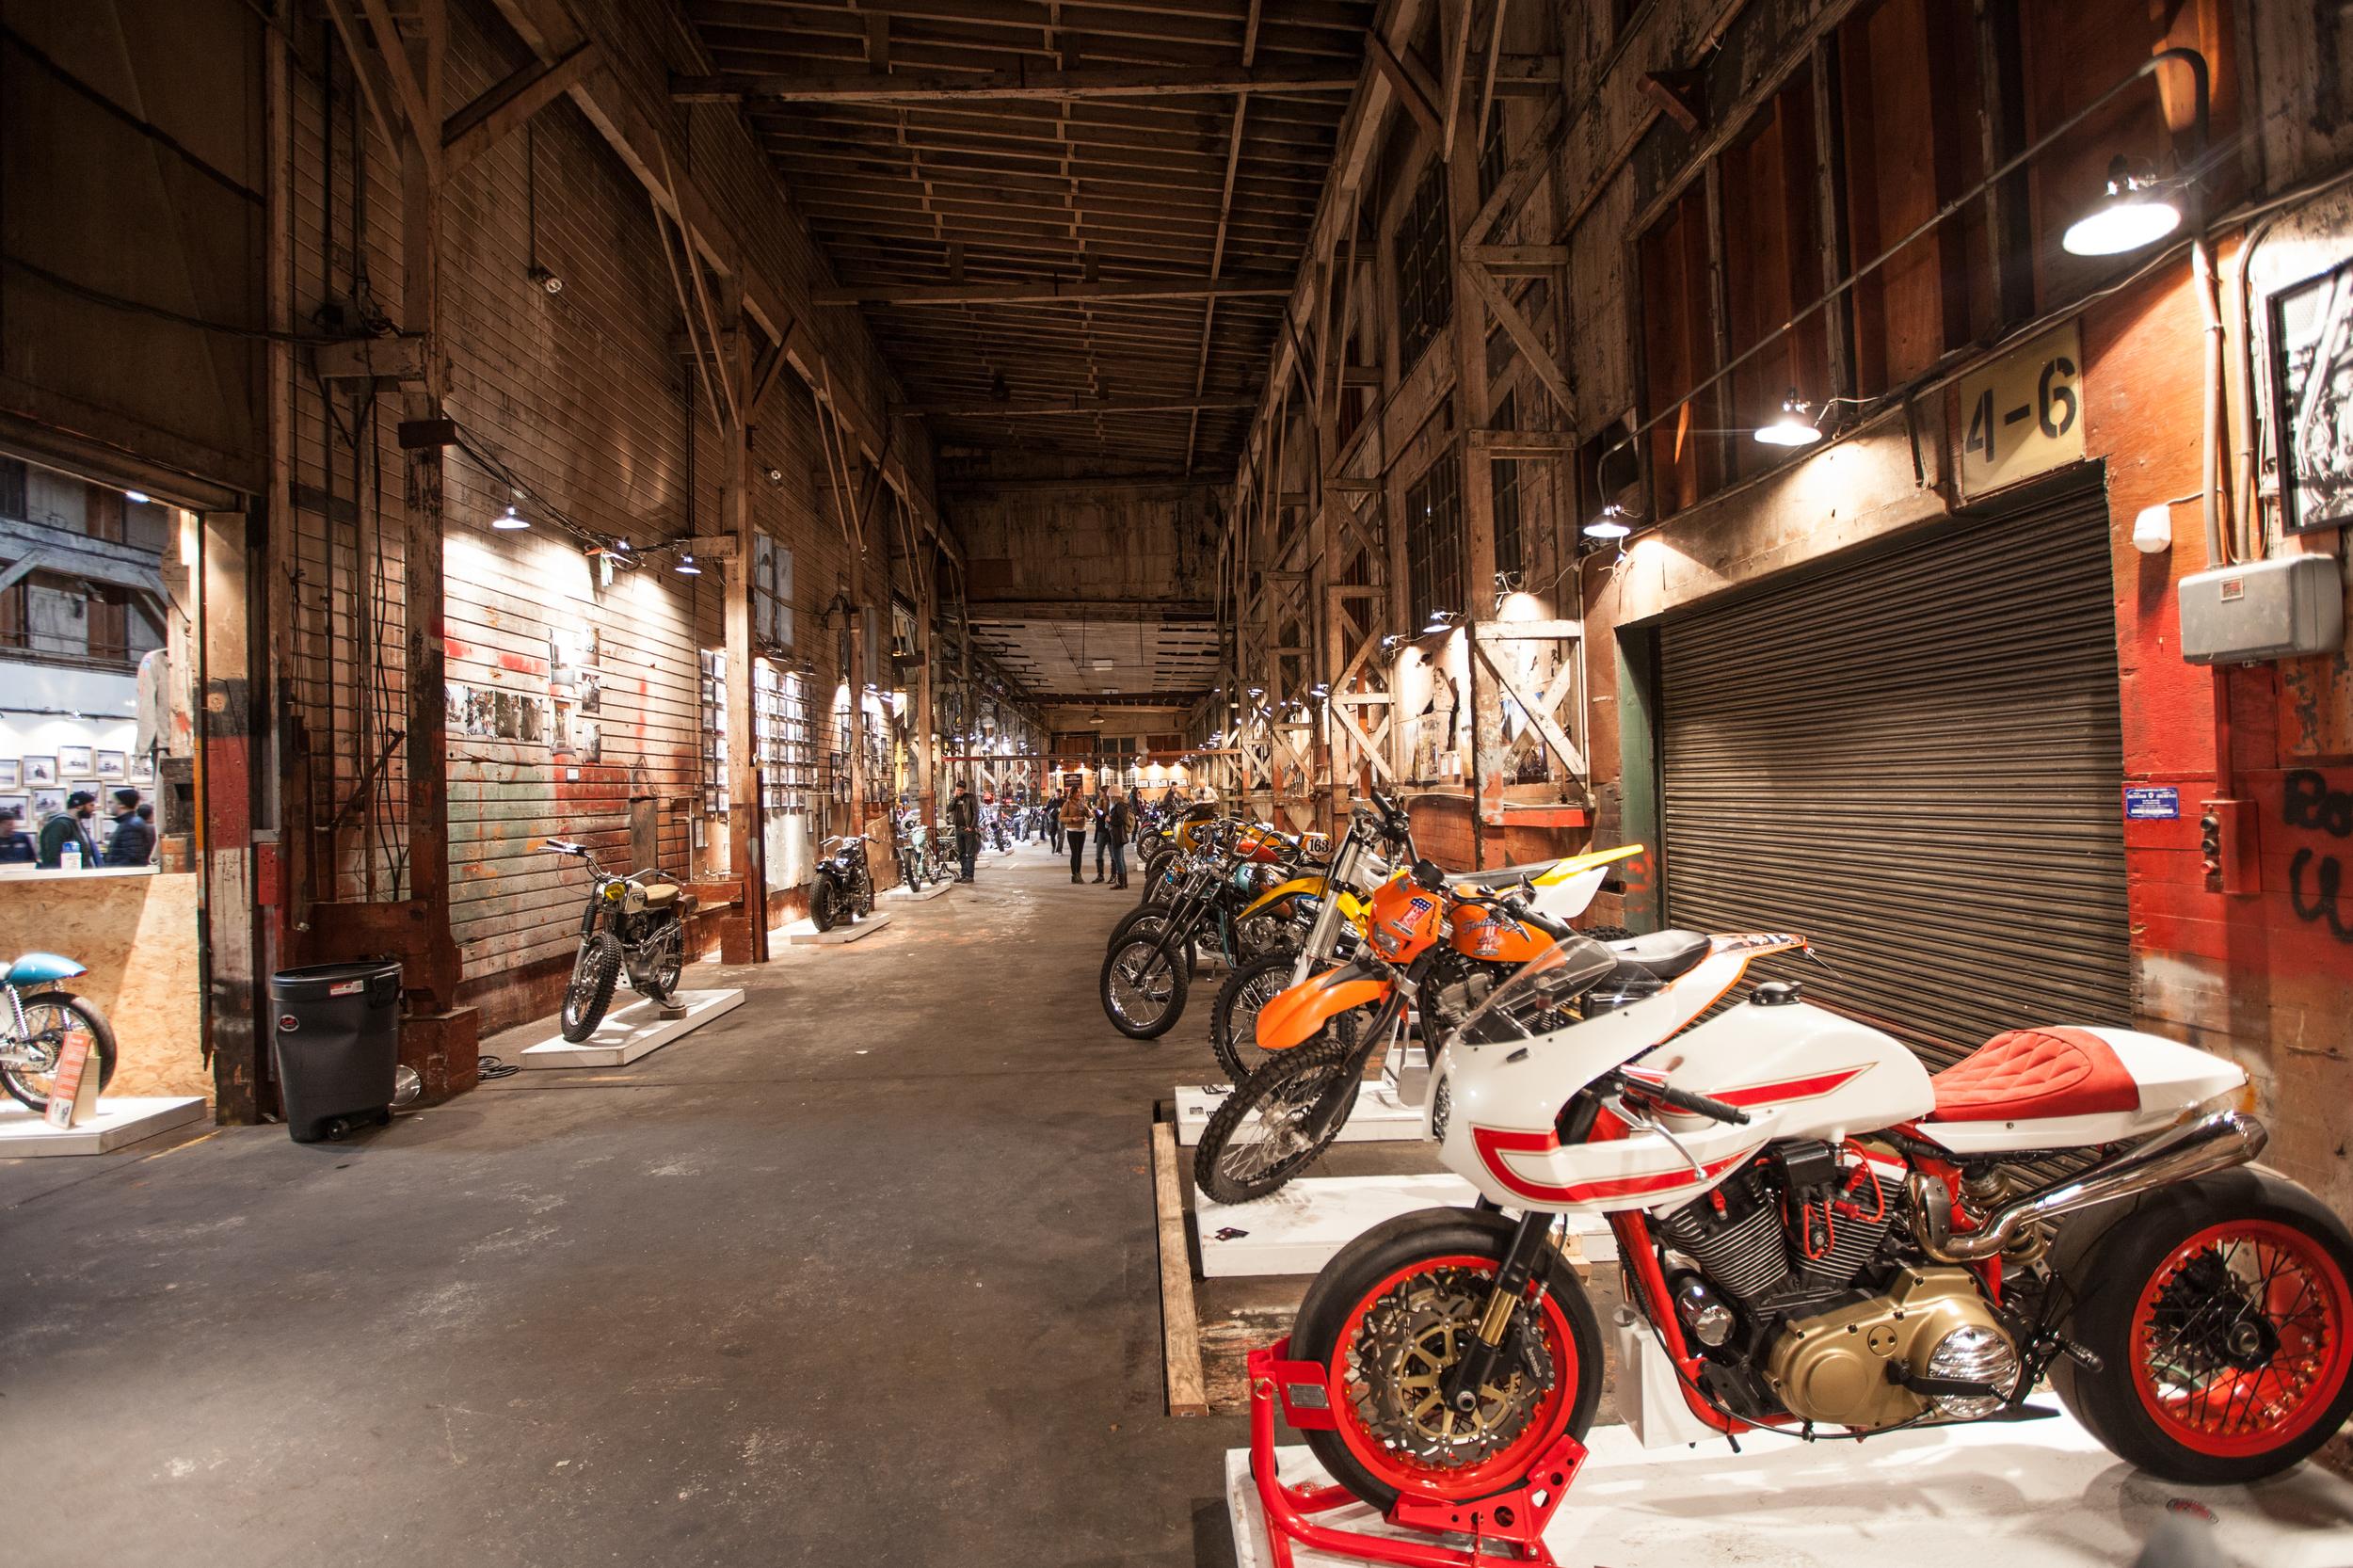 02-14-15 The 1 Moto Show - 2_-70-36.jpg